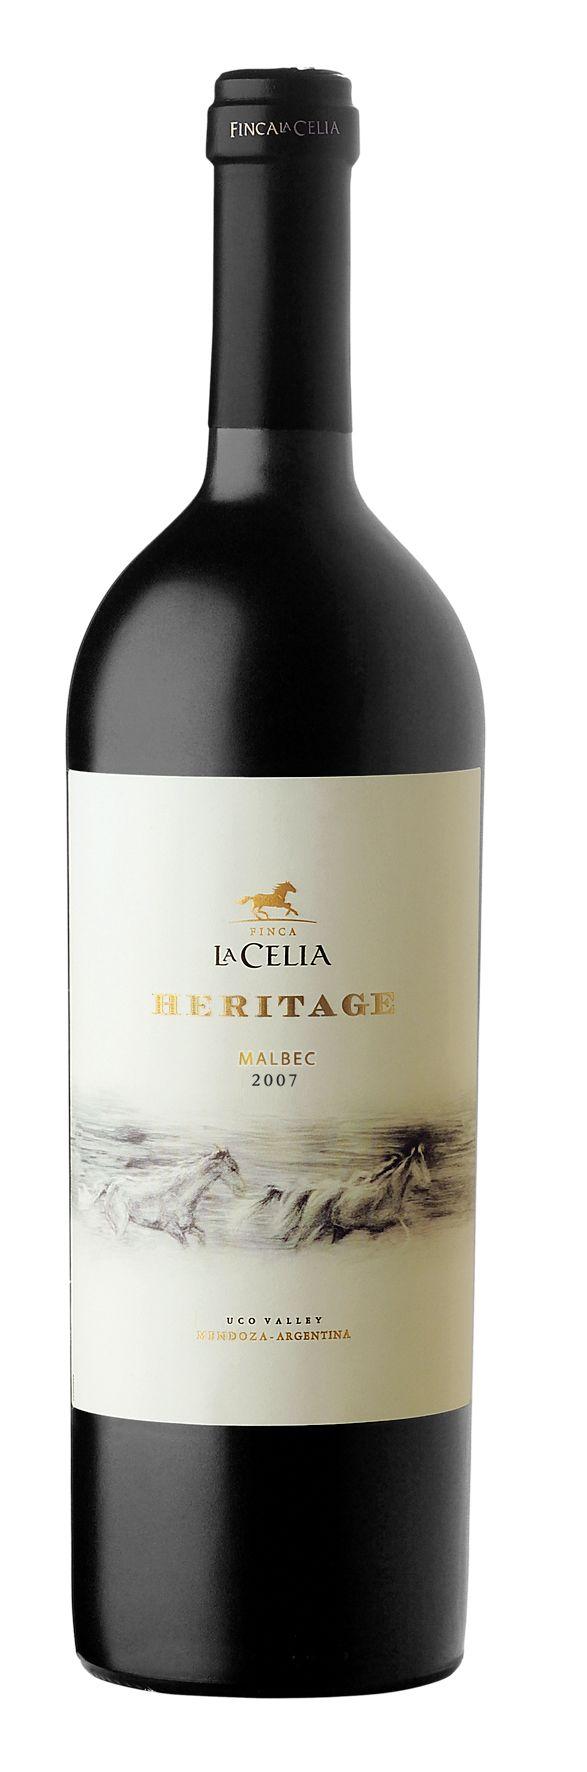 Heritage Malbec - Finca La Celia  (Malbec World Day)  wine / label mxm